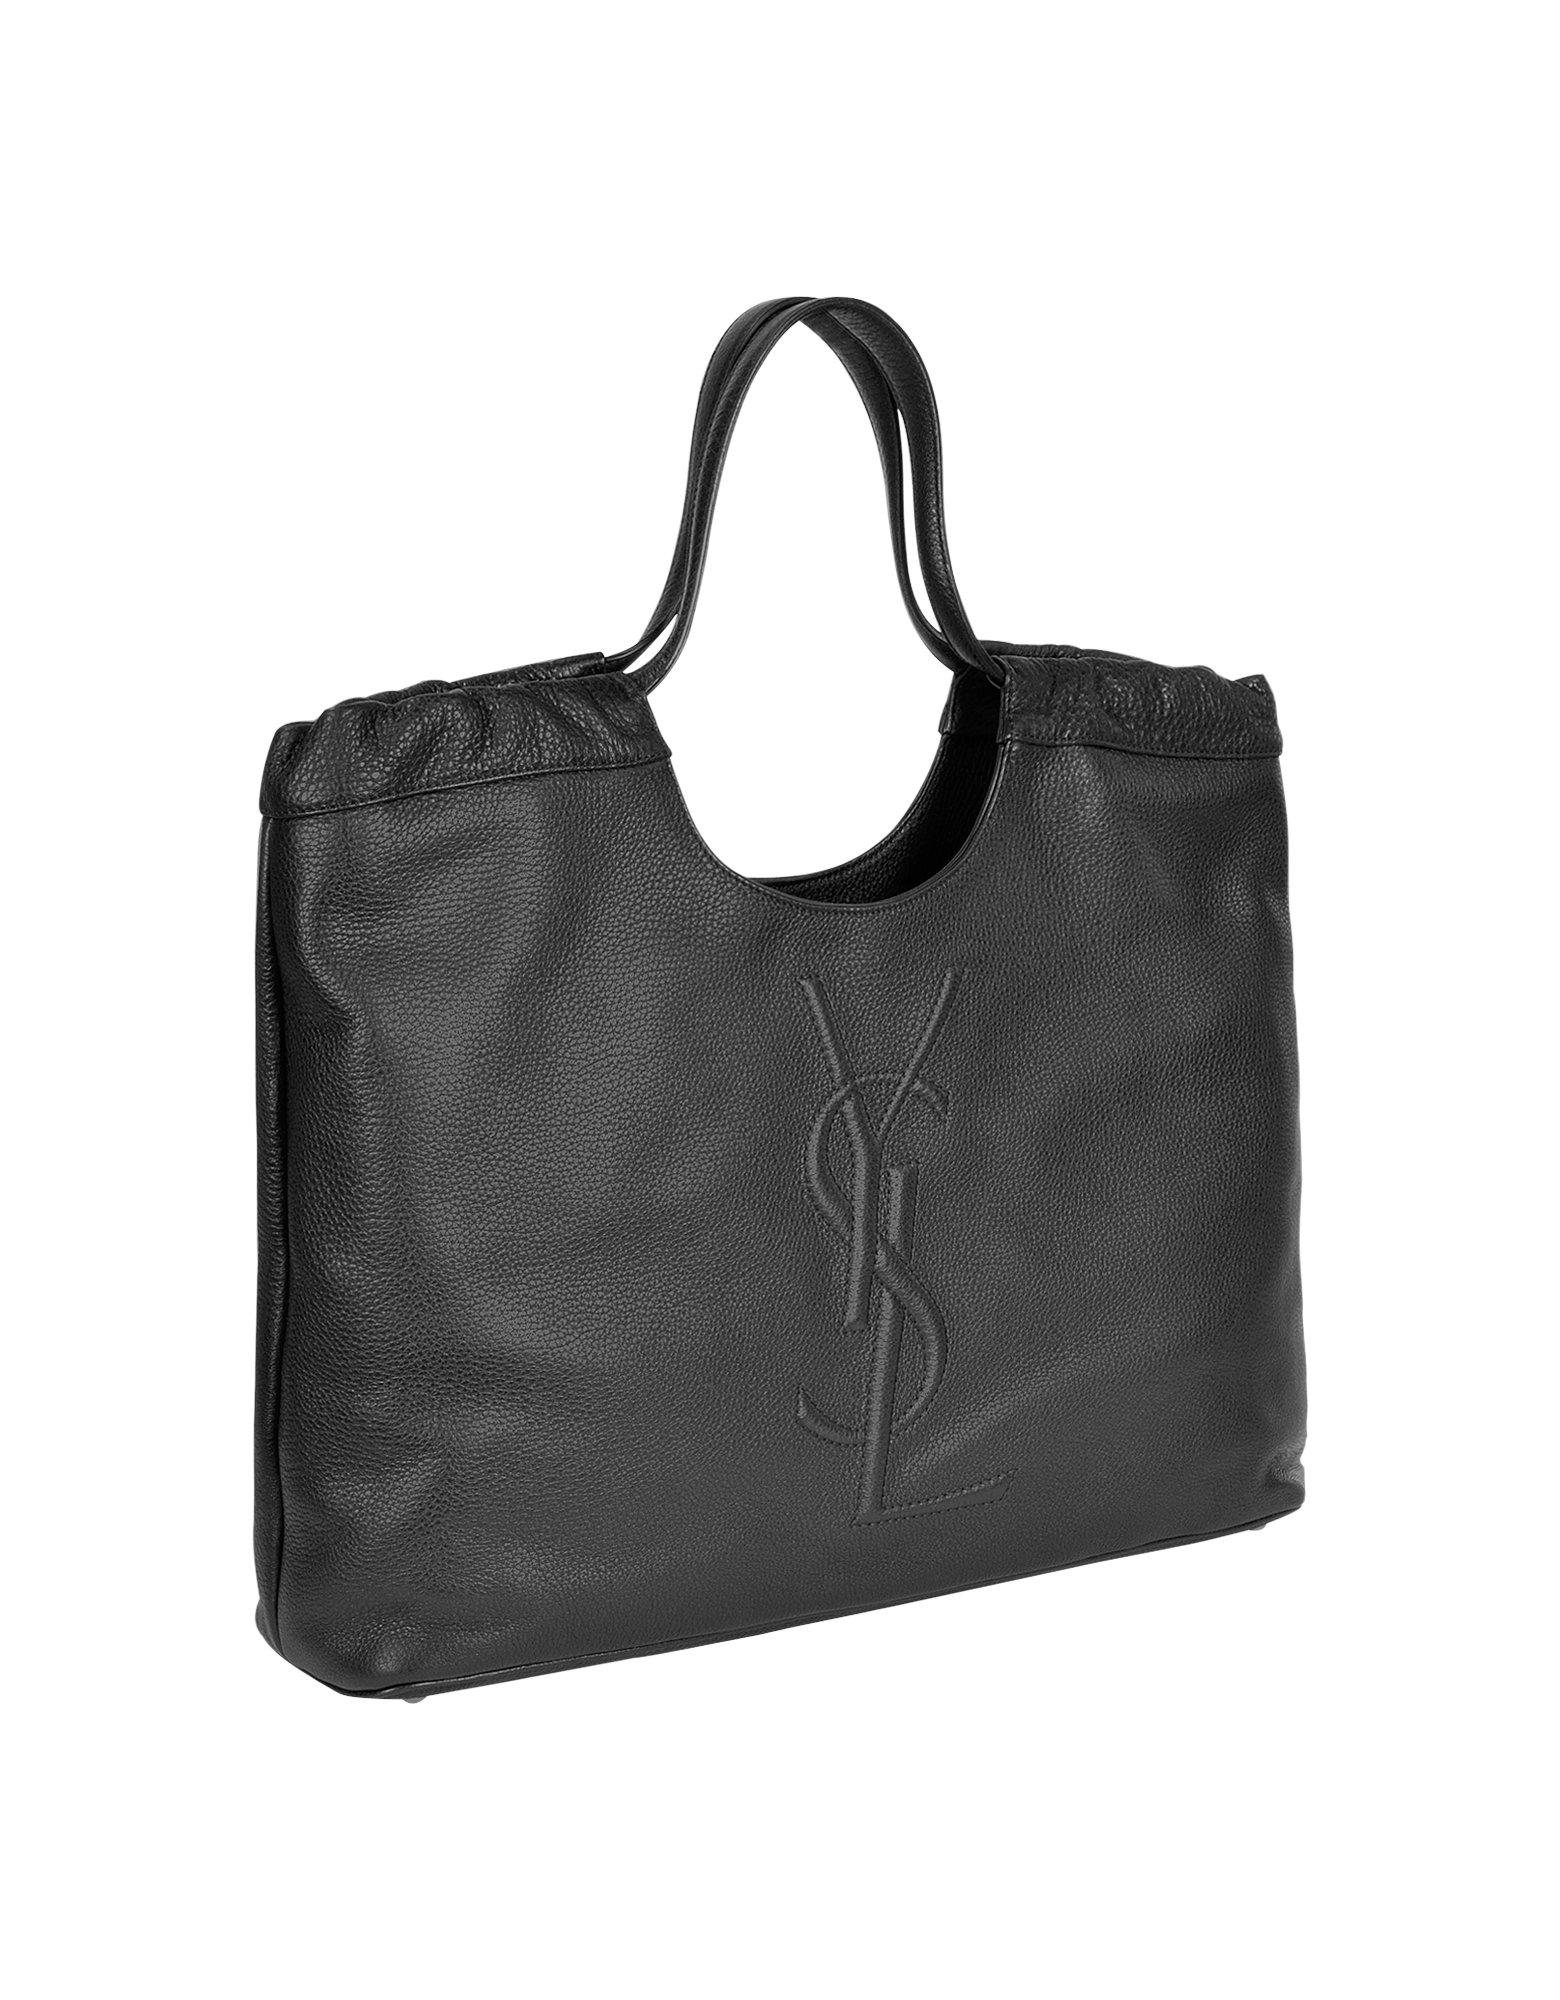 Saint laurent Belle Du Jour Logo Leather Tote Bag in Black | Lyst